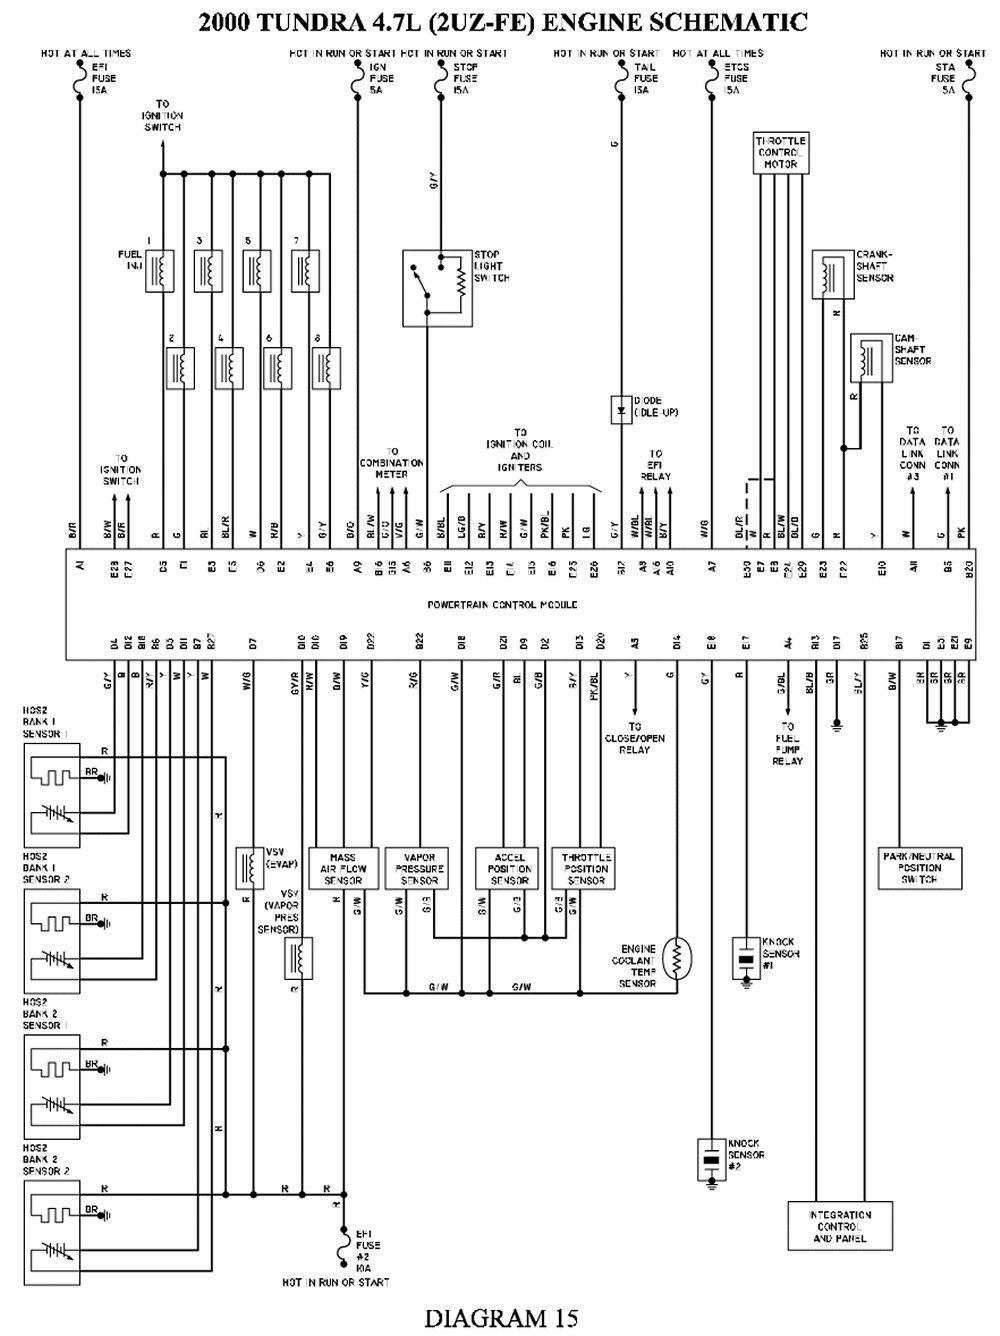 45 Unique 2000 Toyota Tundra Radio Wiring Diagram In 2020 2000 Toyota Tundra Toyota Tundra Toyota